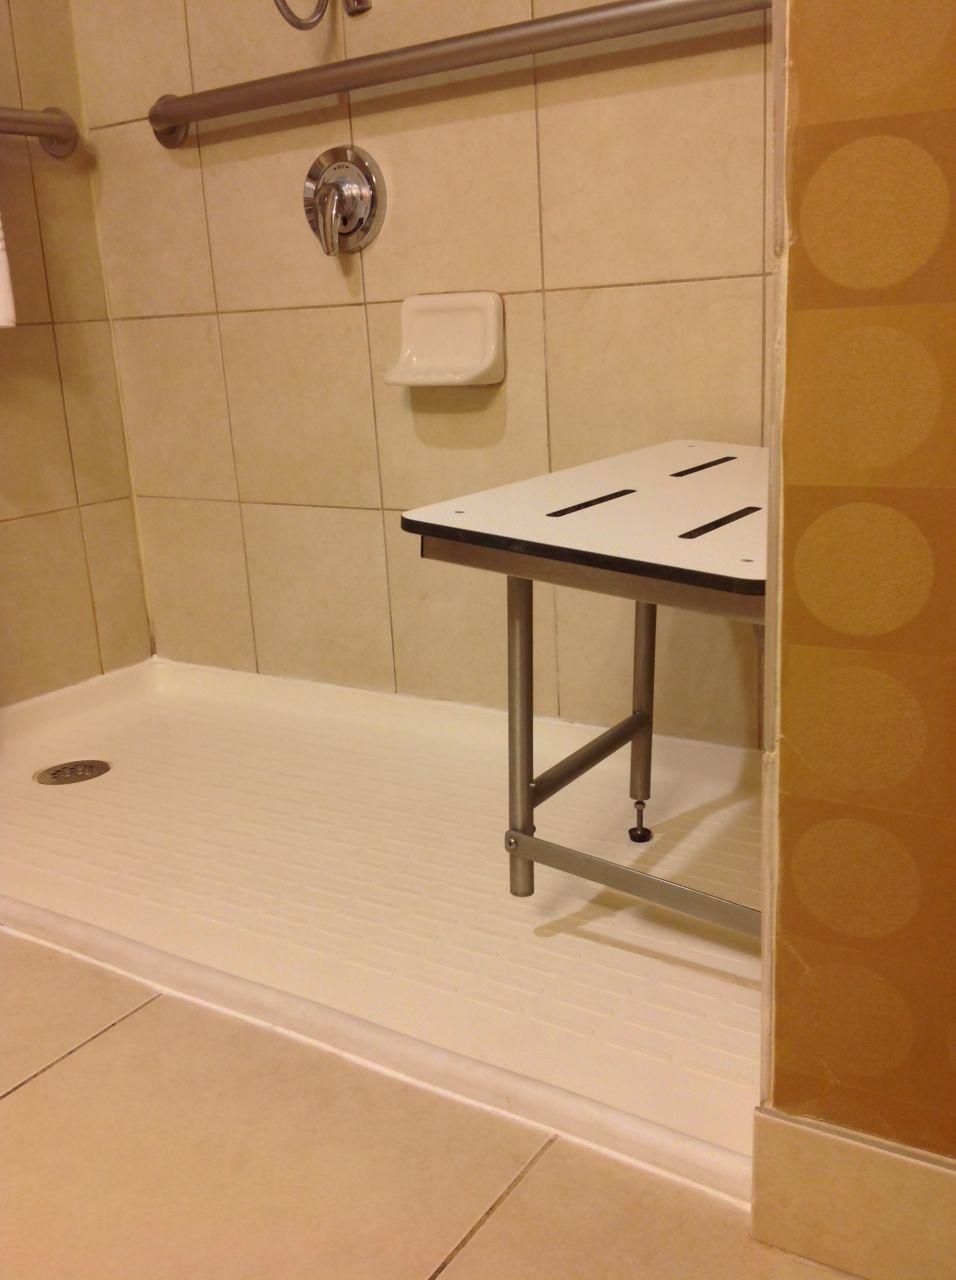 Grout For Shower Base Wet Room